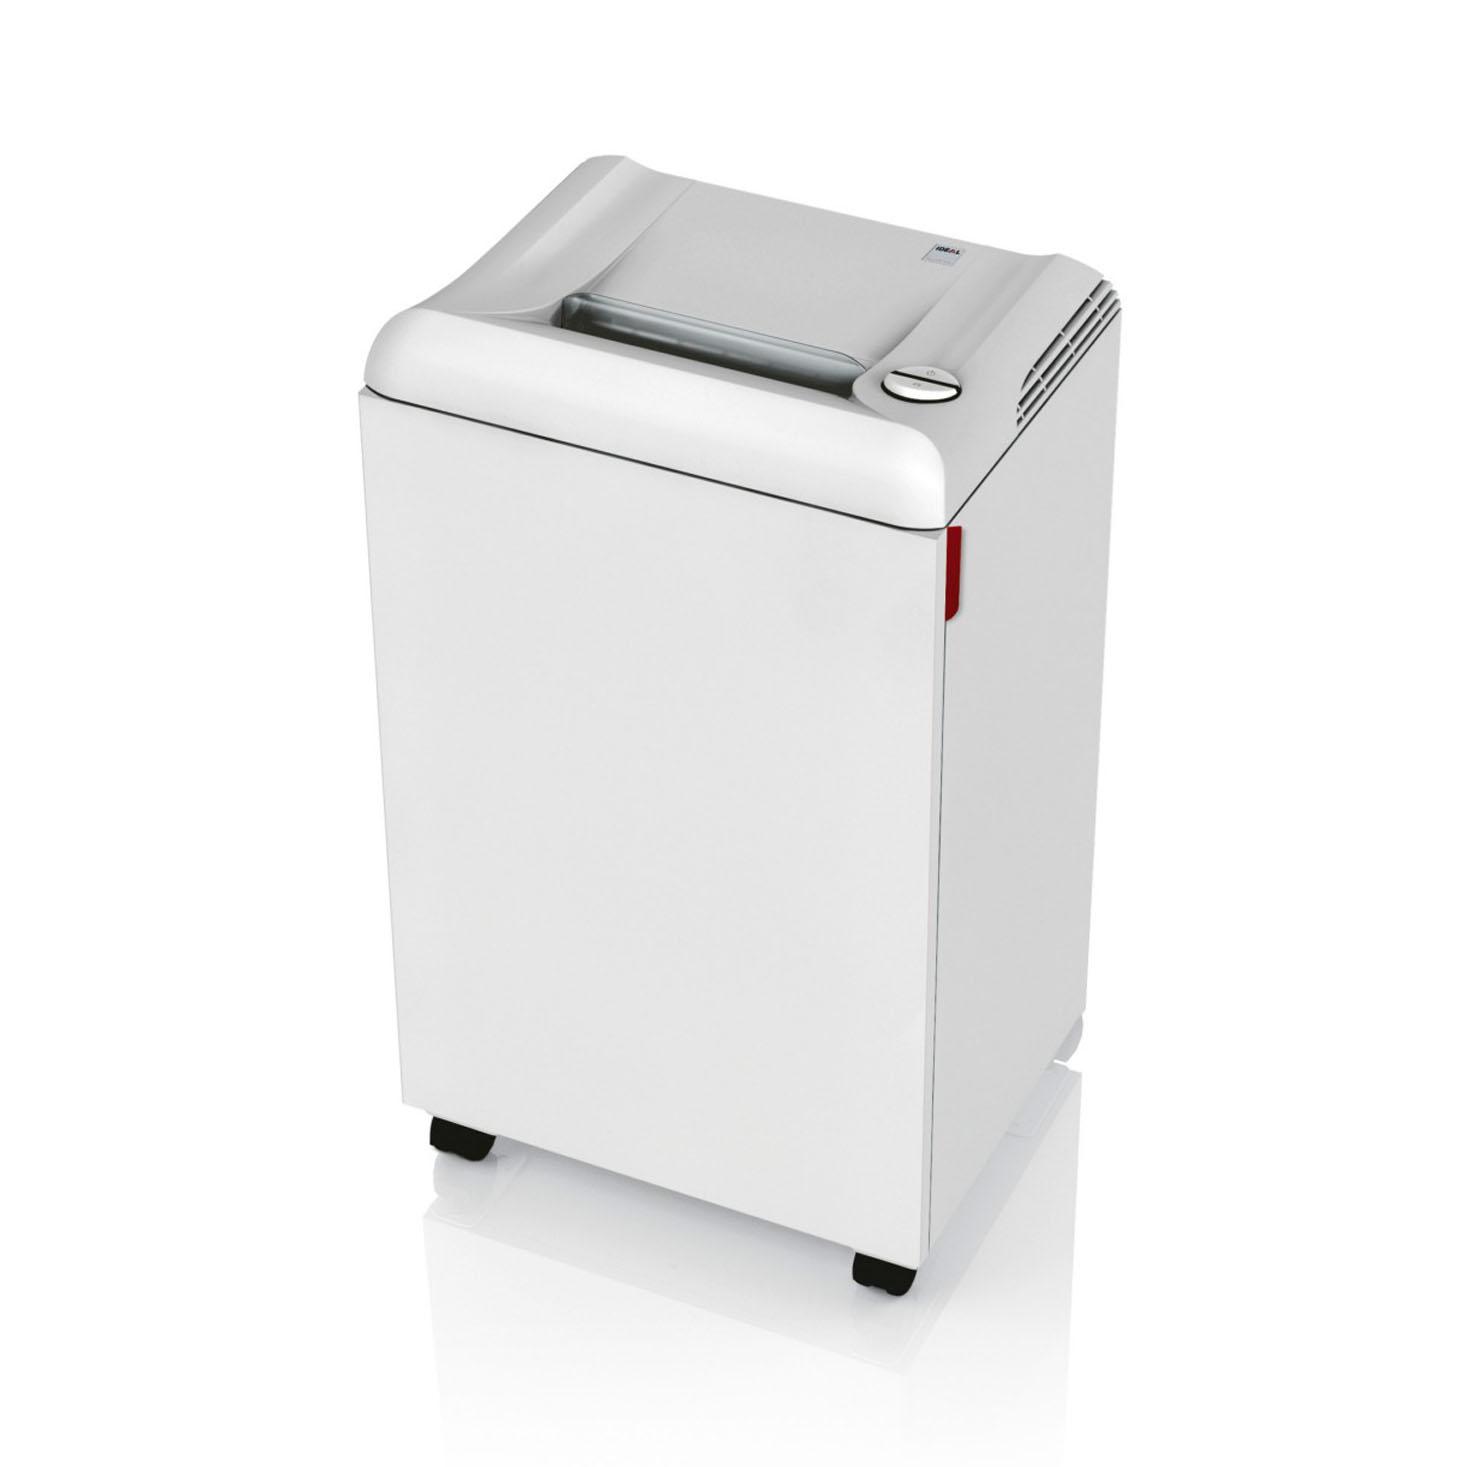 Niszczarka biznes premium - IDEAL 2503 / 4 mm